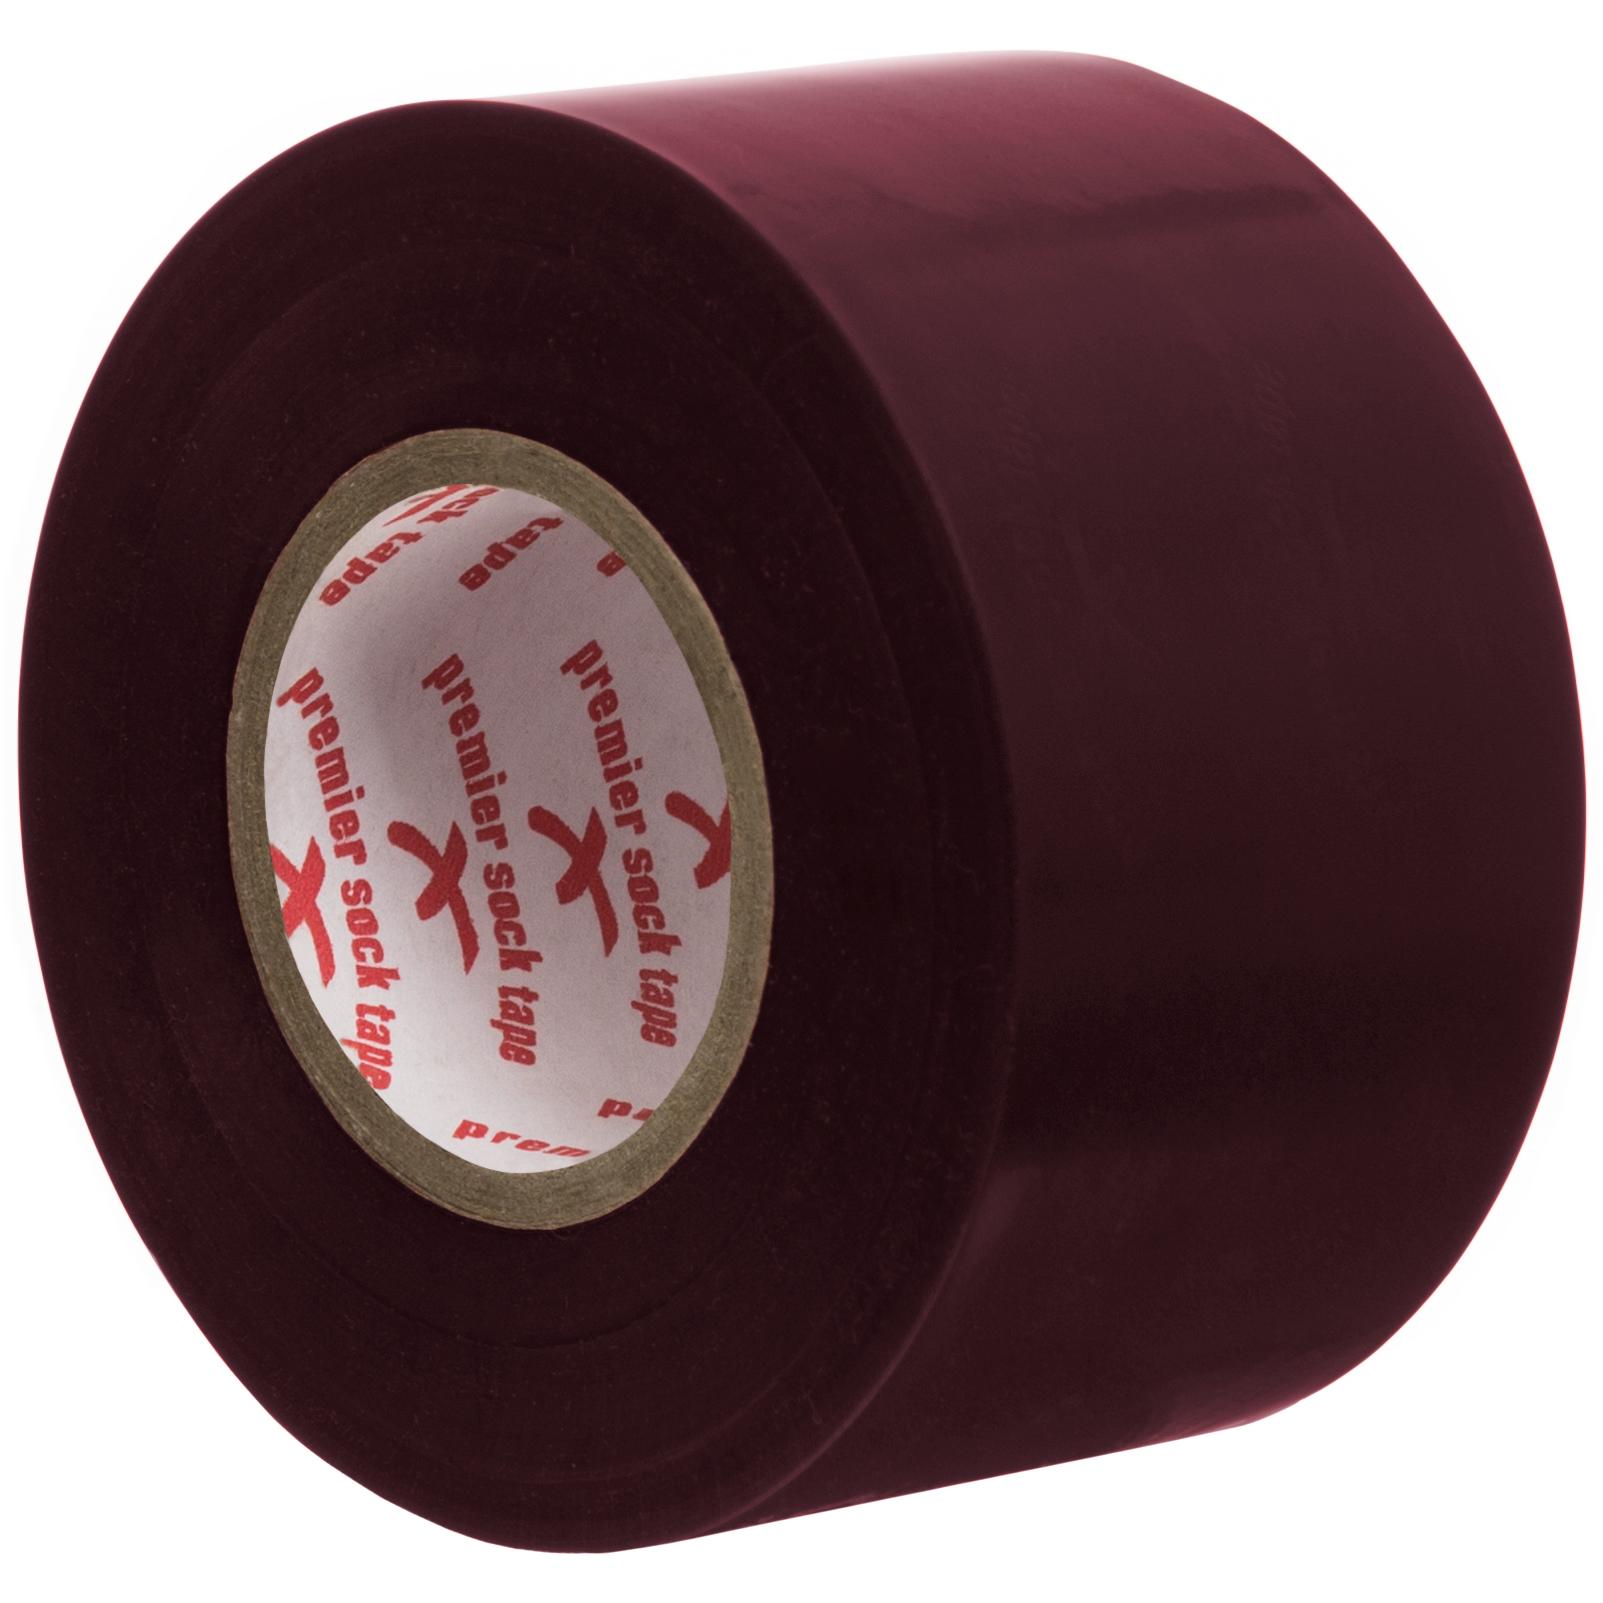 Premier Sock Tape Strumptejp Bred 20m Bordeaux